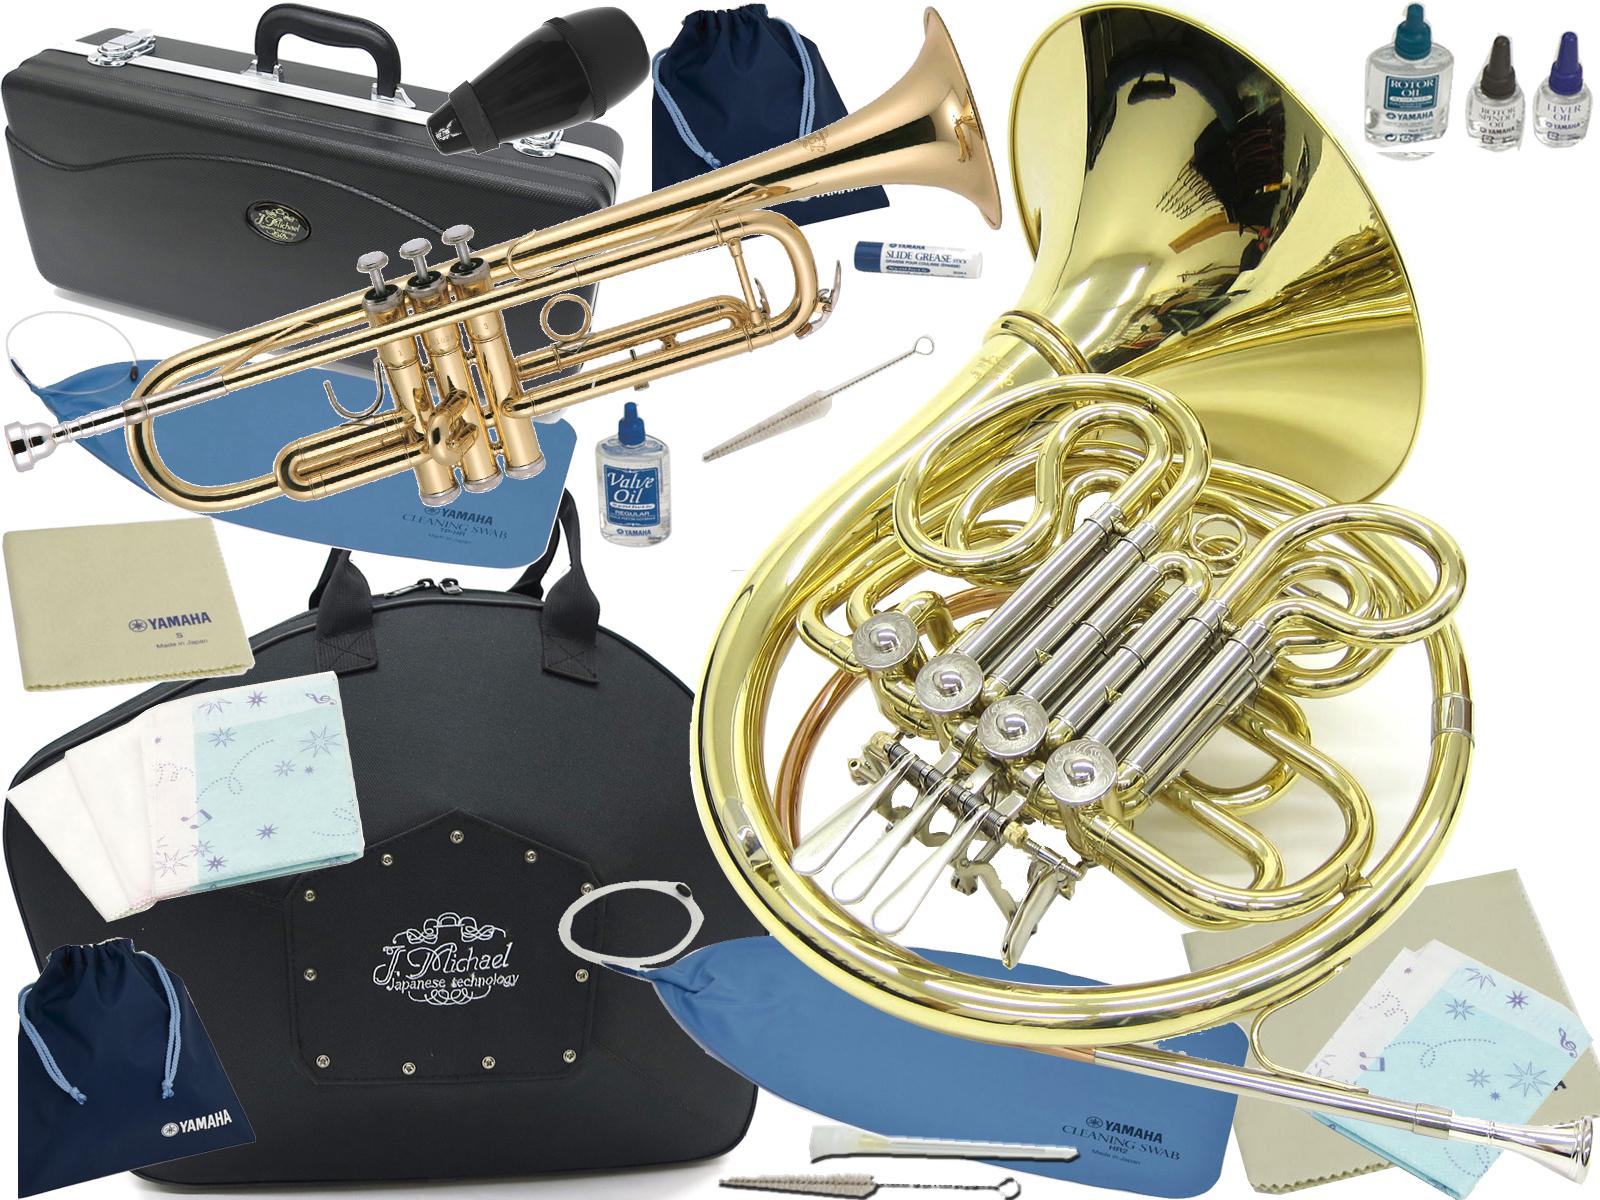 J Michael ( Jマイケル ) FH-850 フルダブルホルン 新品 F/B♭ 4ロータリー ダブルホルン 初心者 ホルン 管楽器 フレンチホルン 管体 デタッチャブル FH850 セット G